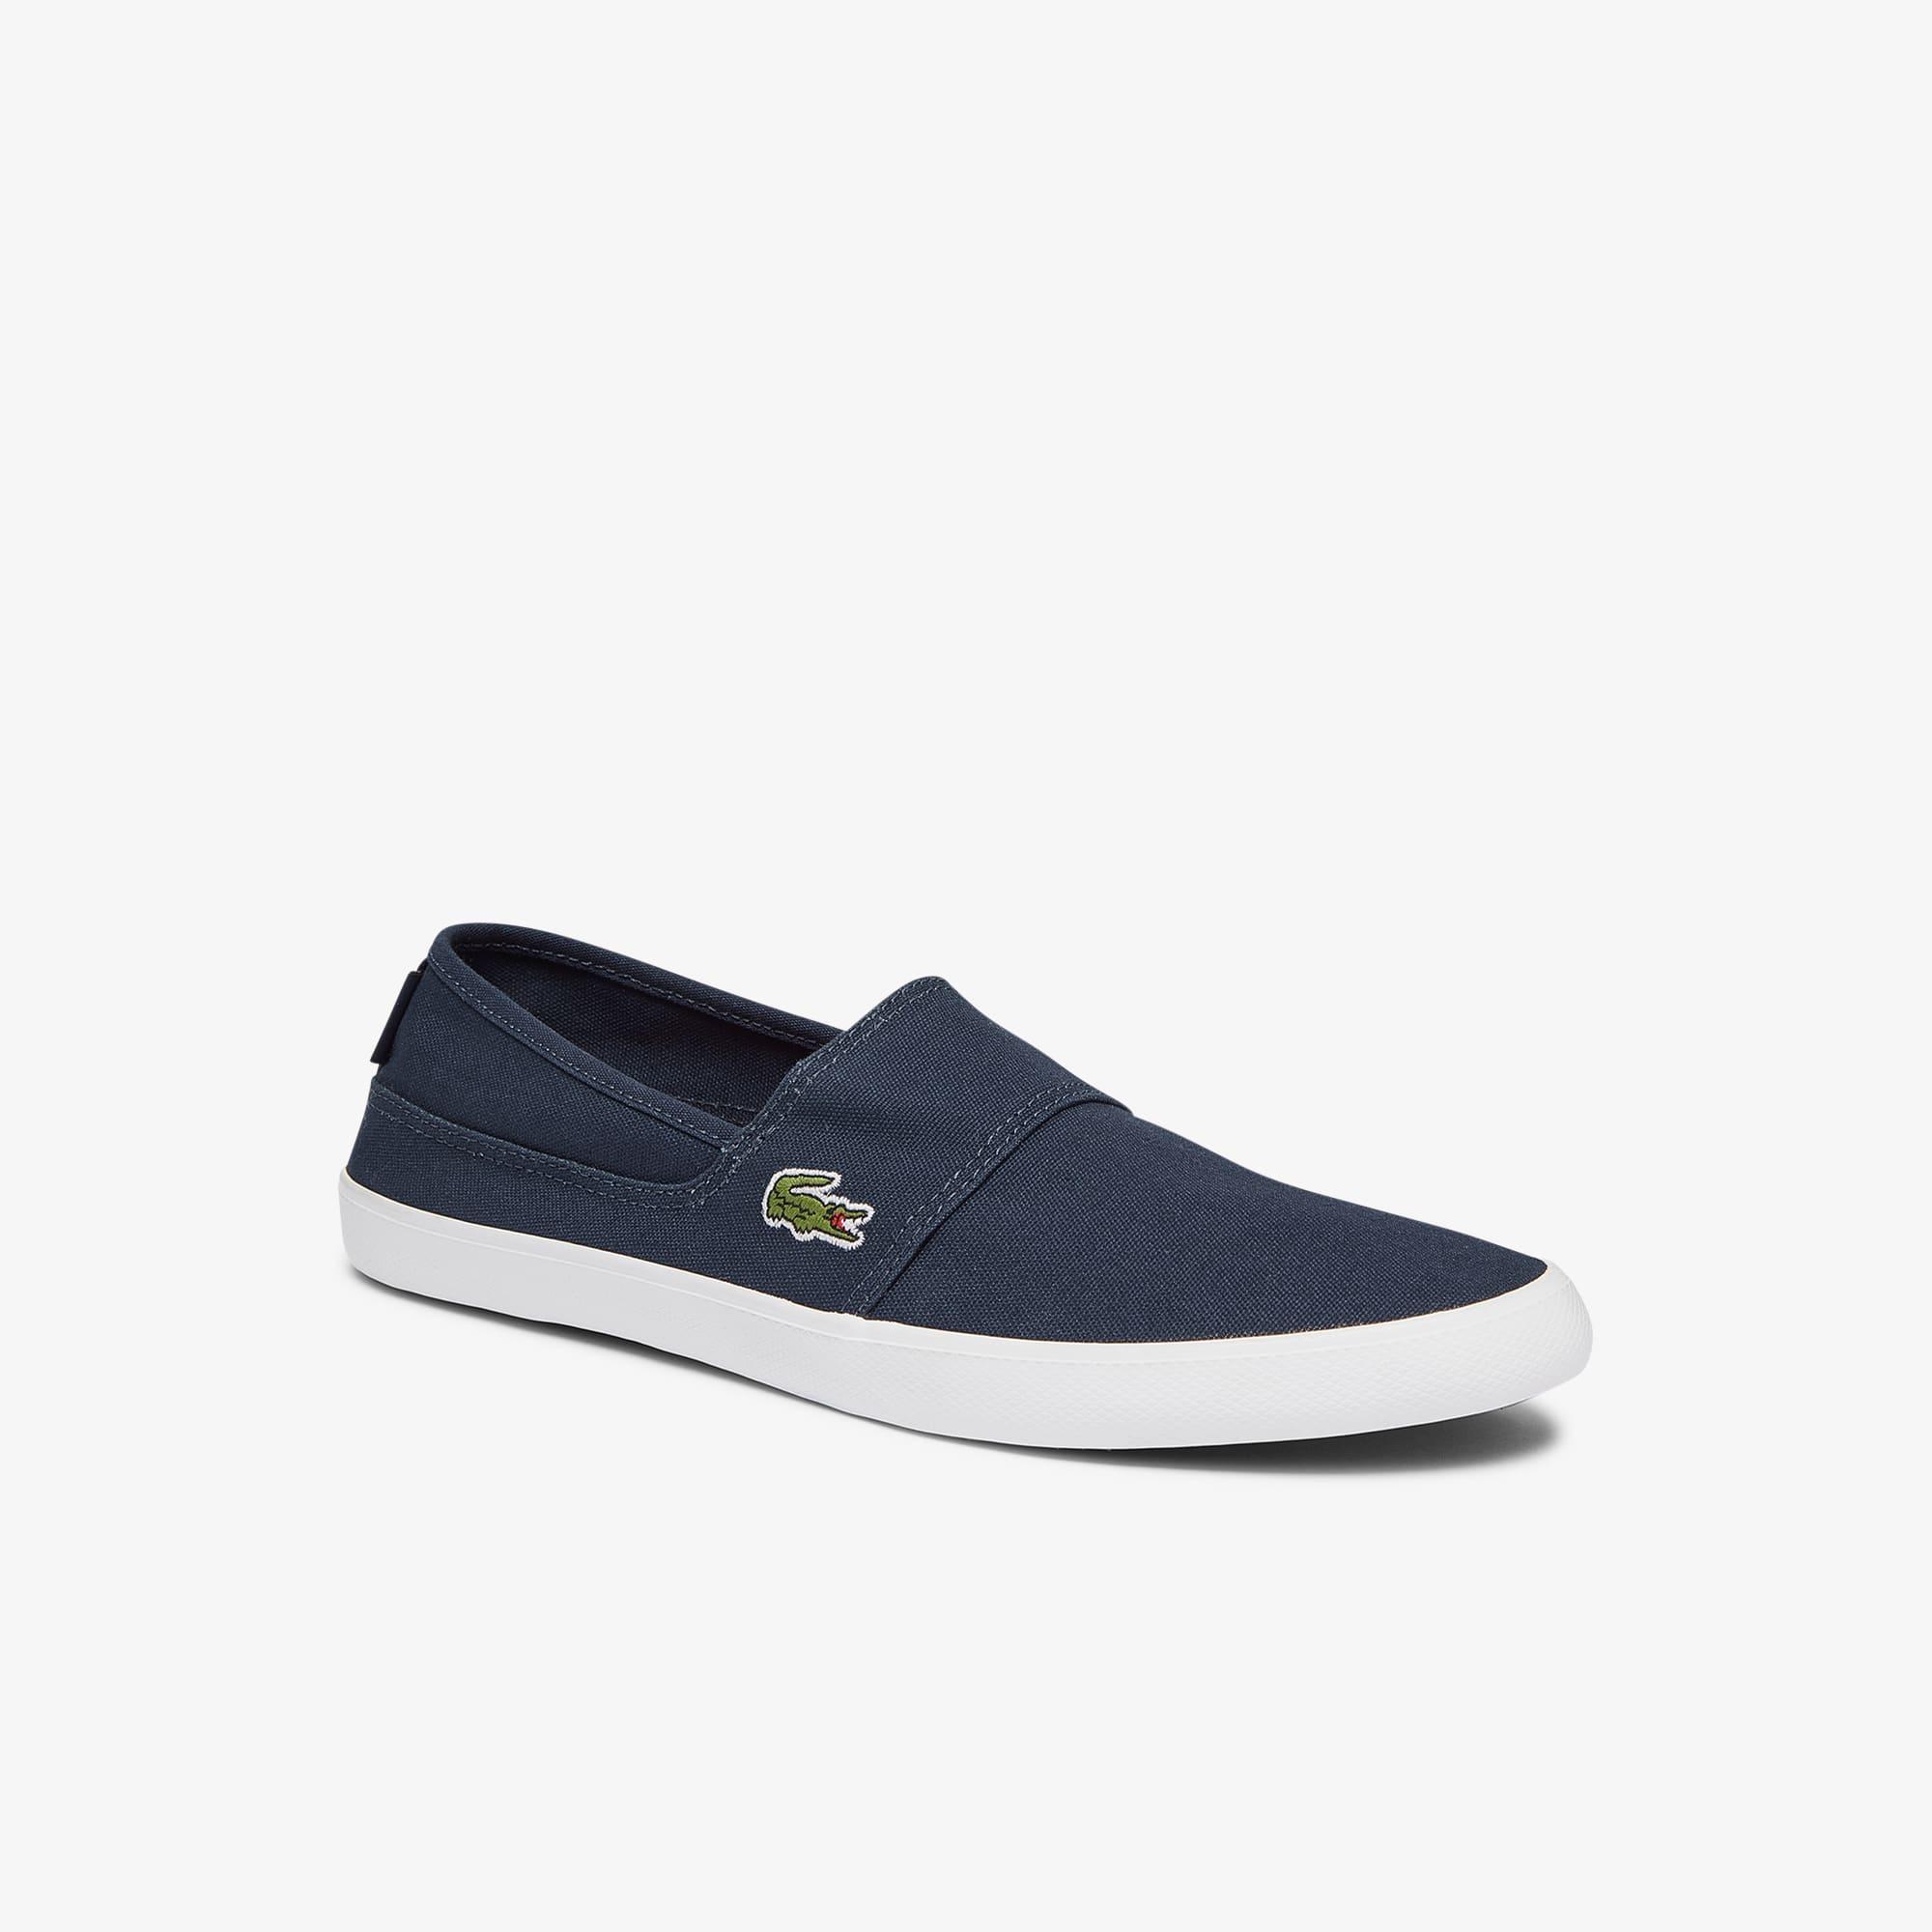 Sneakers senza stringhe Marice in tela